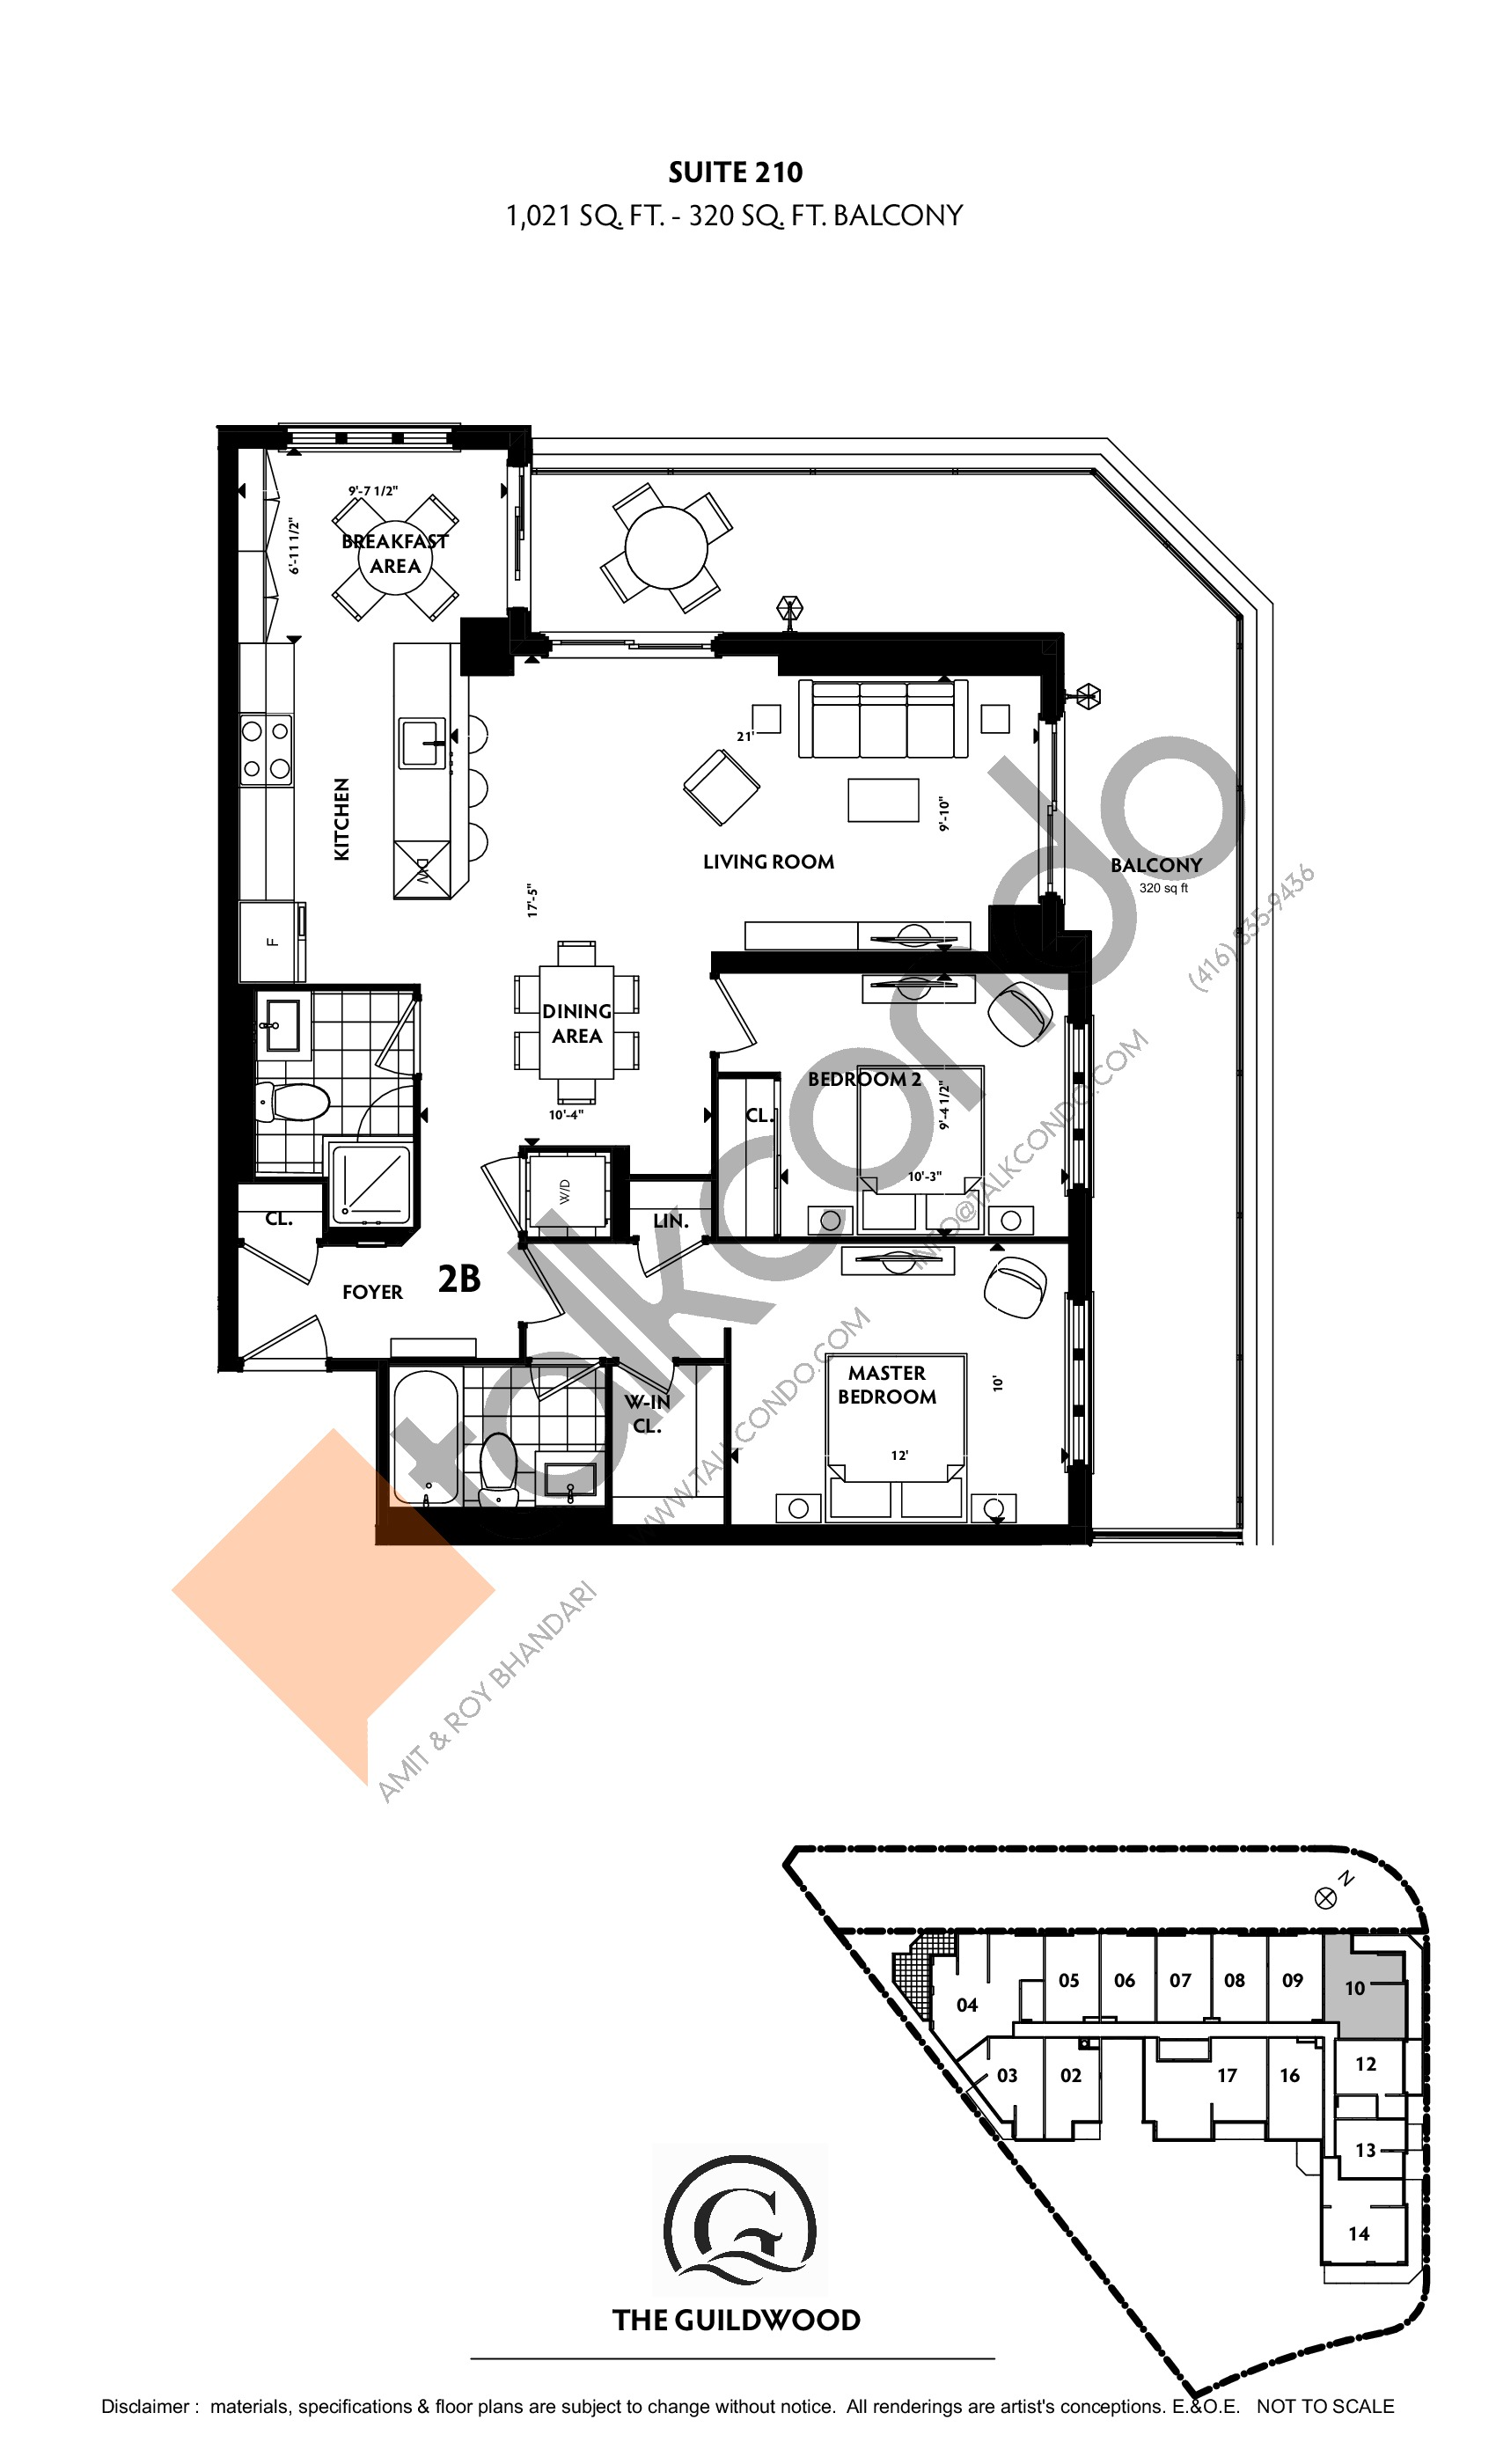 Suite 210 Floor Plan at Guildwood Condos - 1021 sq.ft